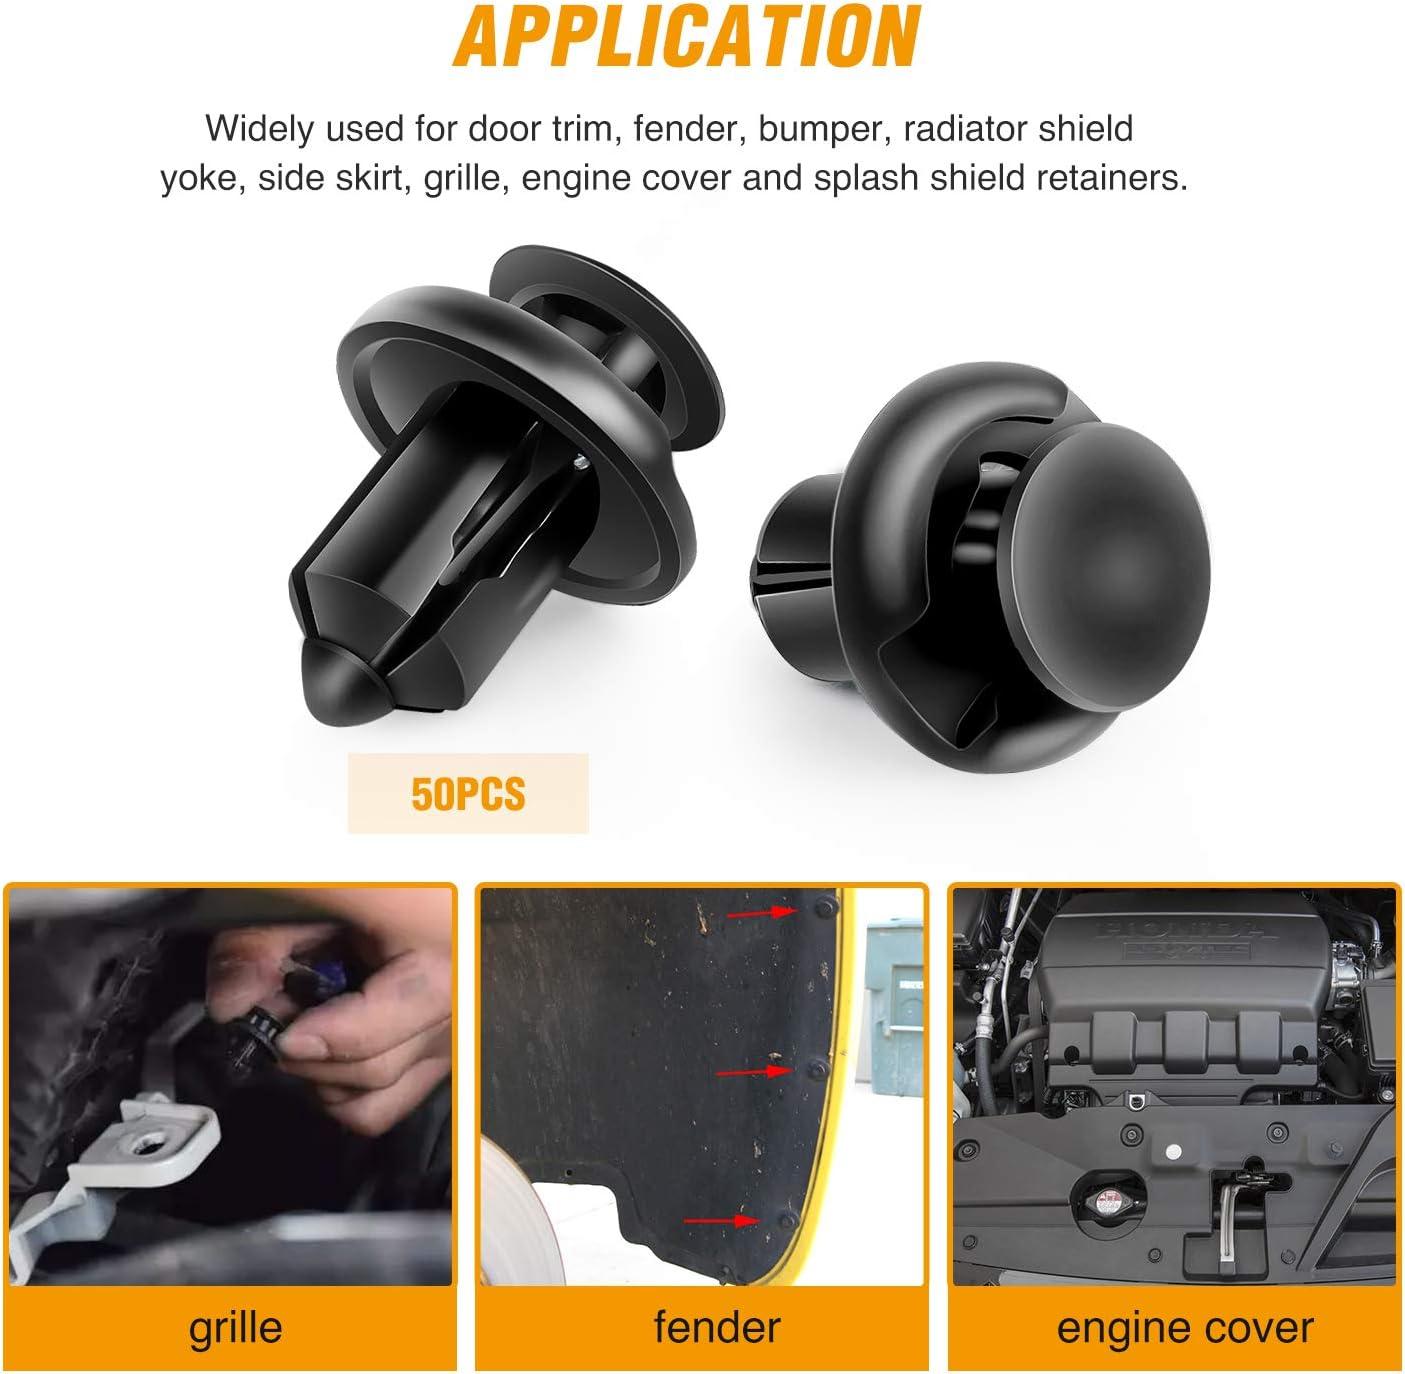 GOOACC 40PCS GRC-31 150PCS Rivet 2 Sizes Universal Auto Bumper Fender Clips Replacement-Fastener Removal Tool